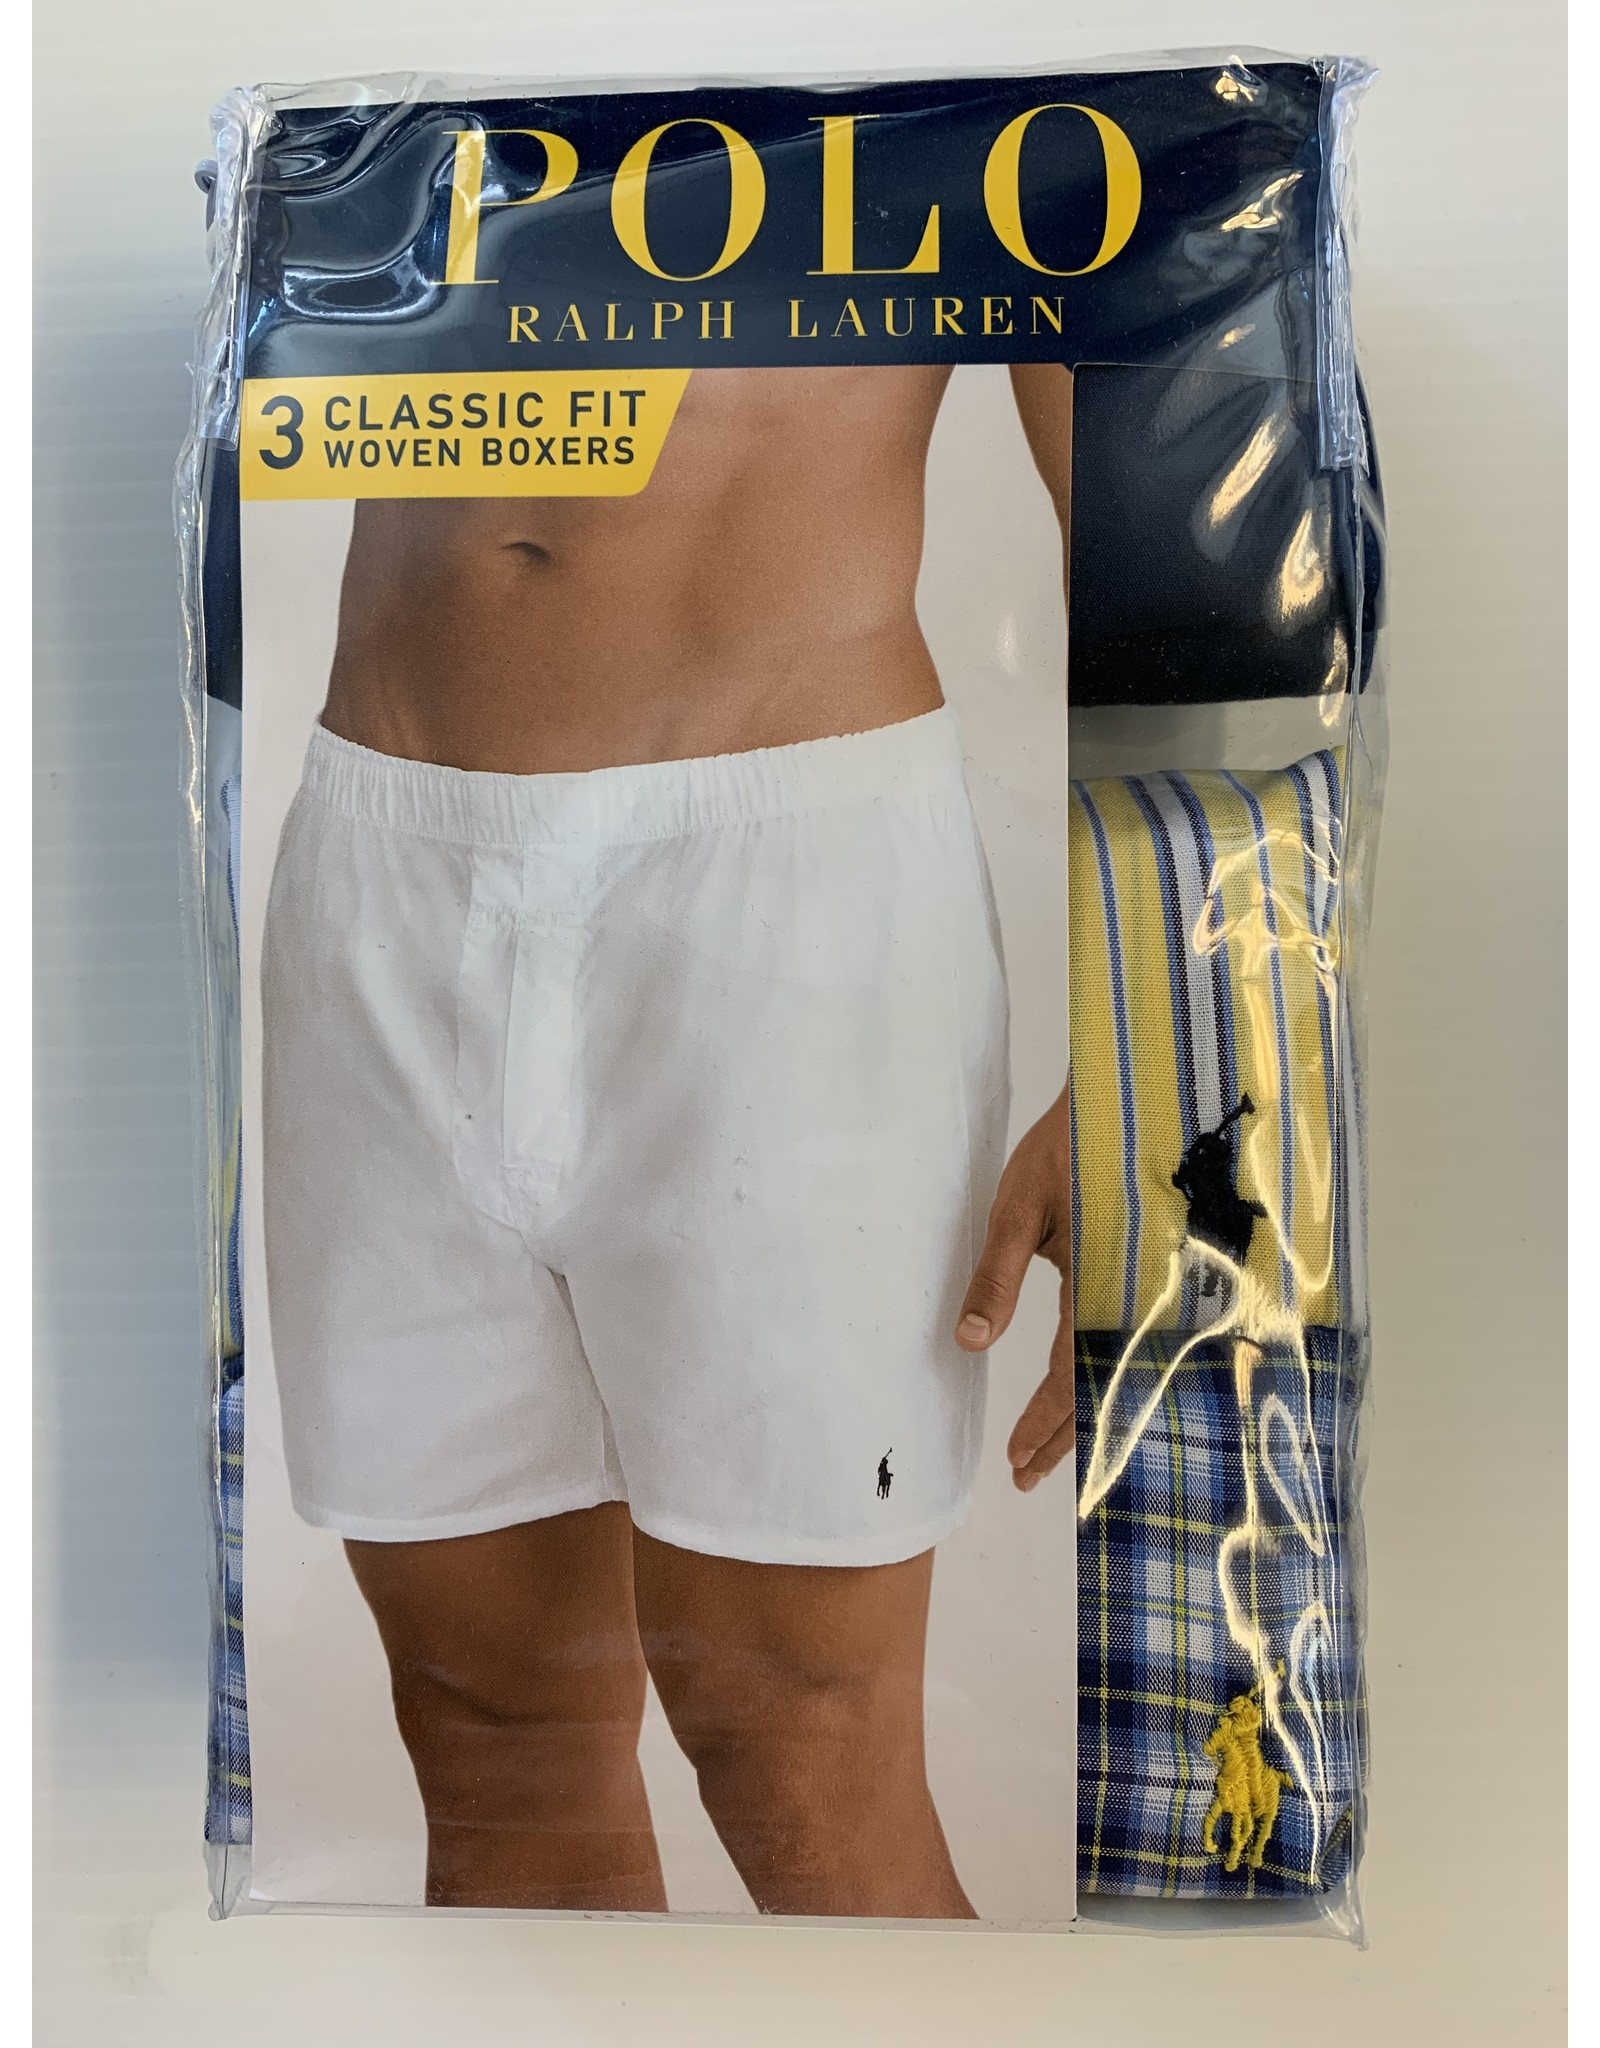 Polo Ralph Lauren Polo Ralph Lauren Men's Classic Fit Woven Boxers 3-Pack